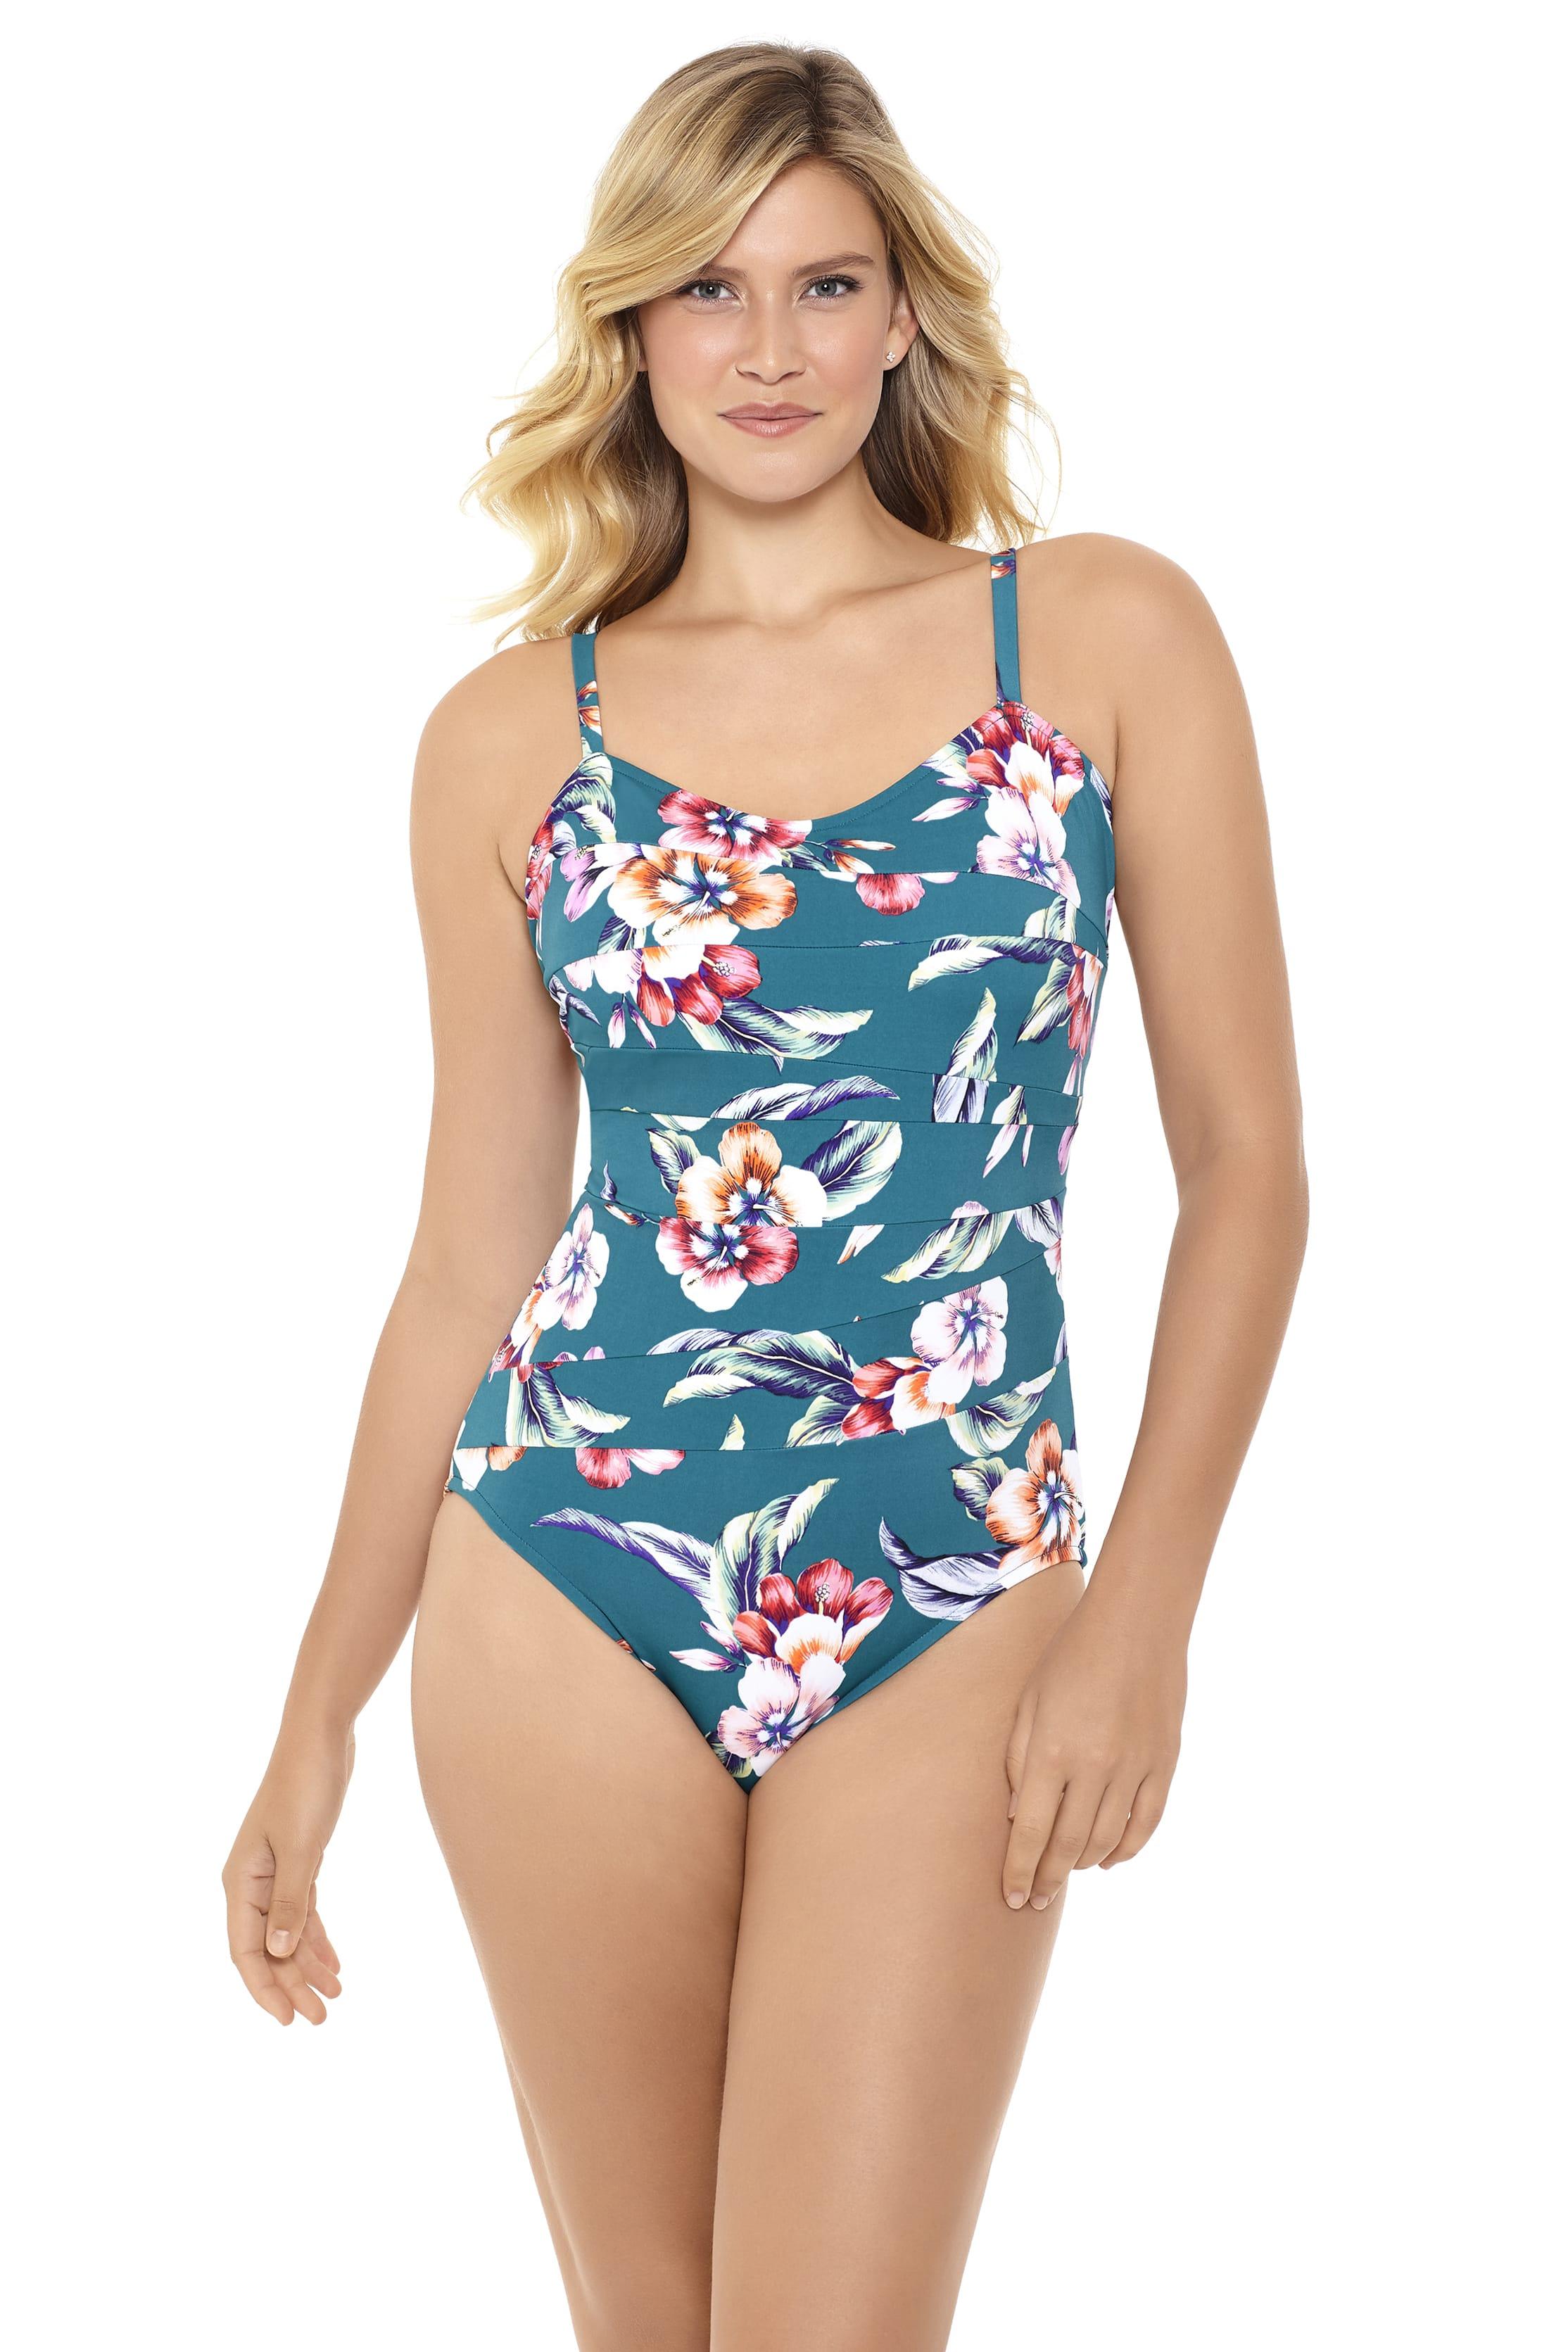 Penbrooke Vintage Floral Seamed One Piece Swimsuit - Teal - Front